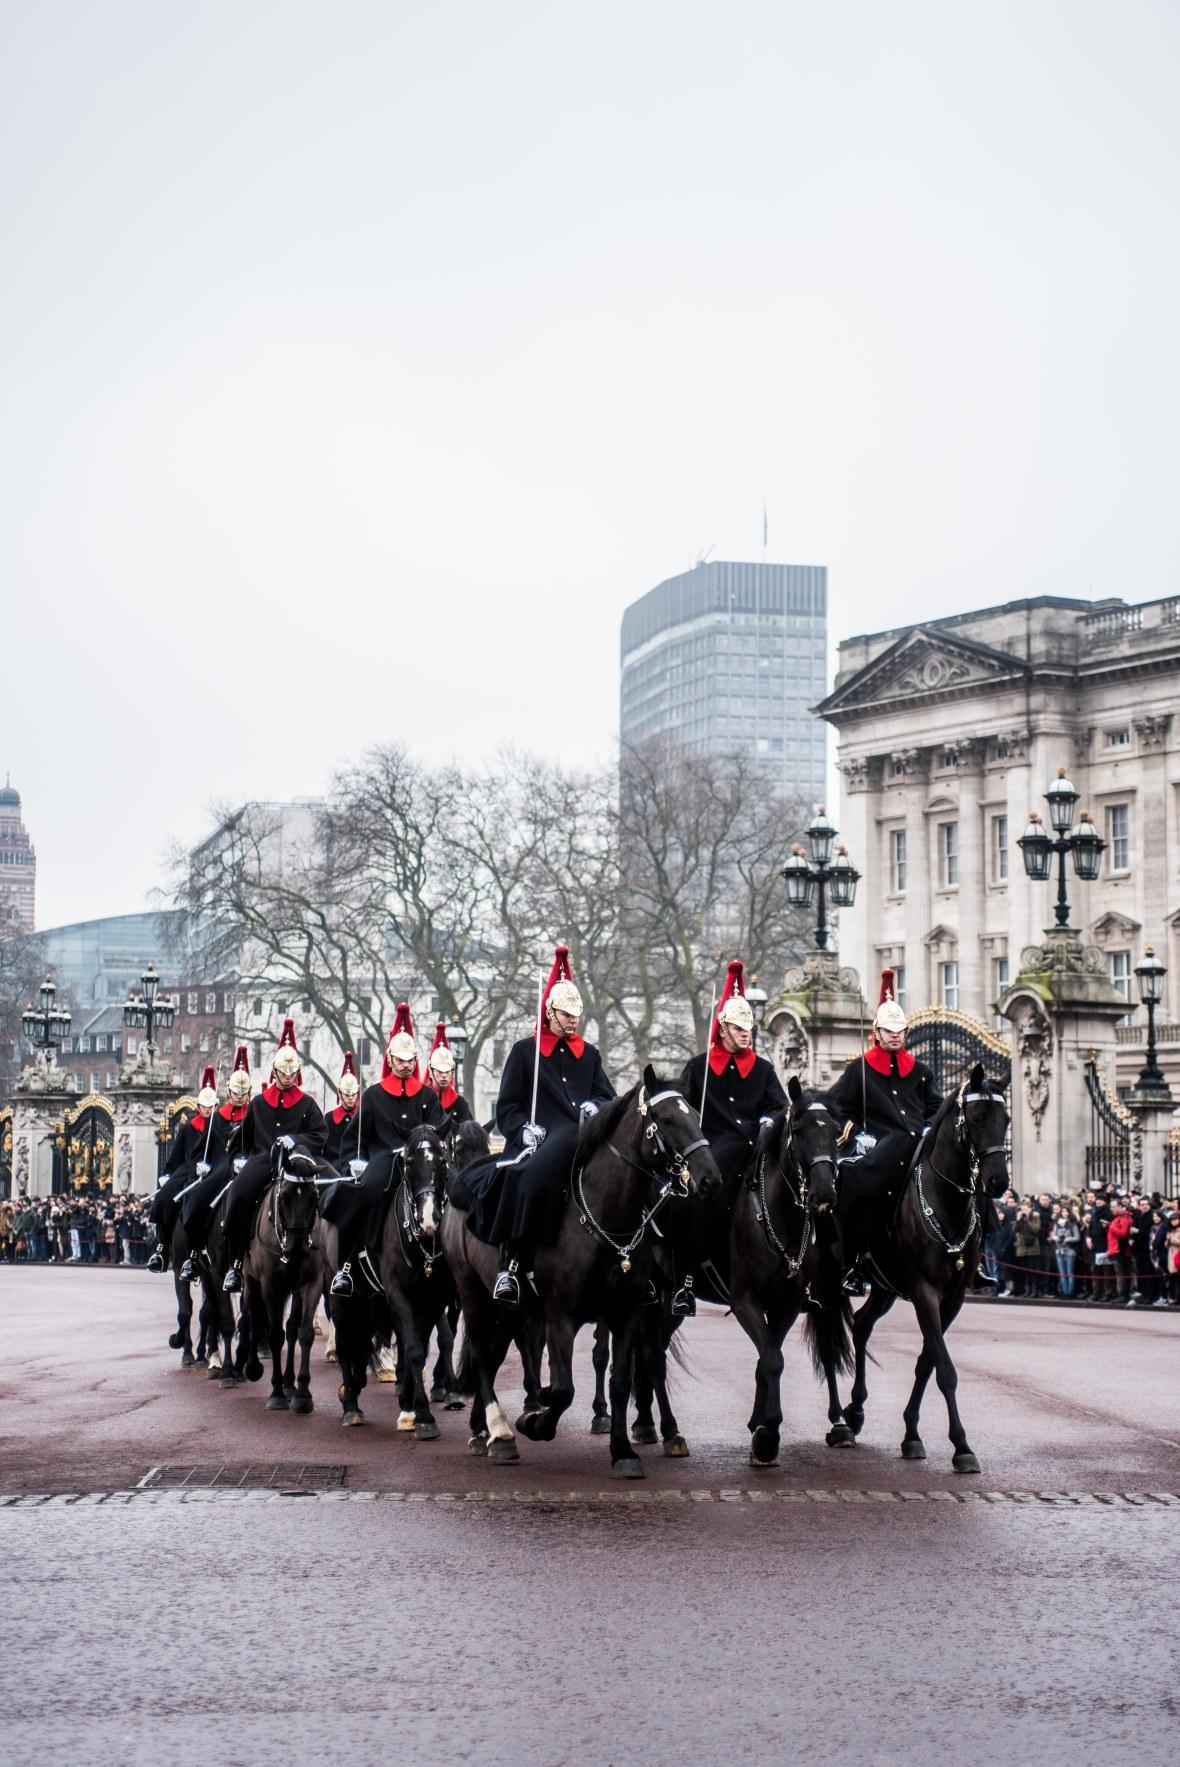 london-sights-6